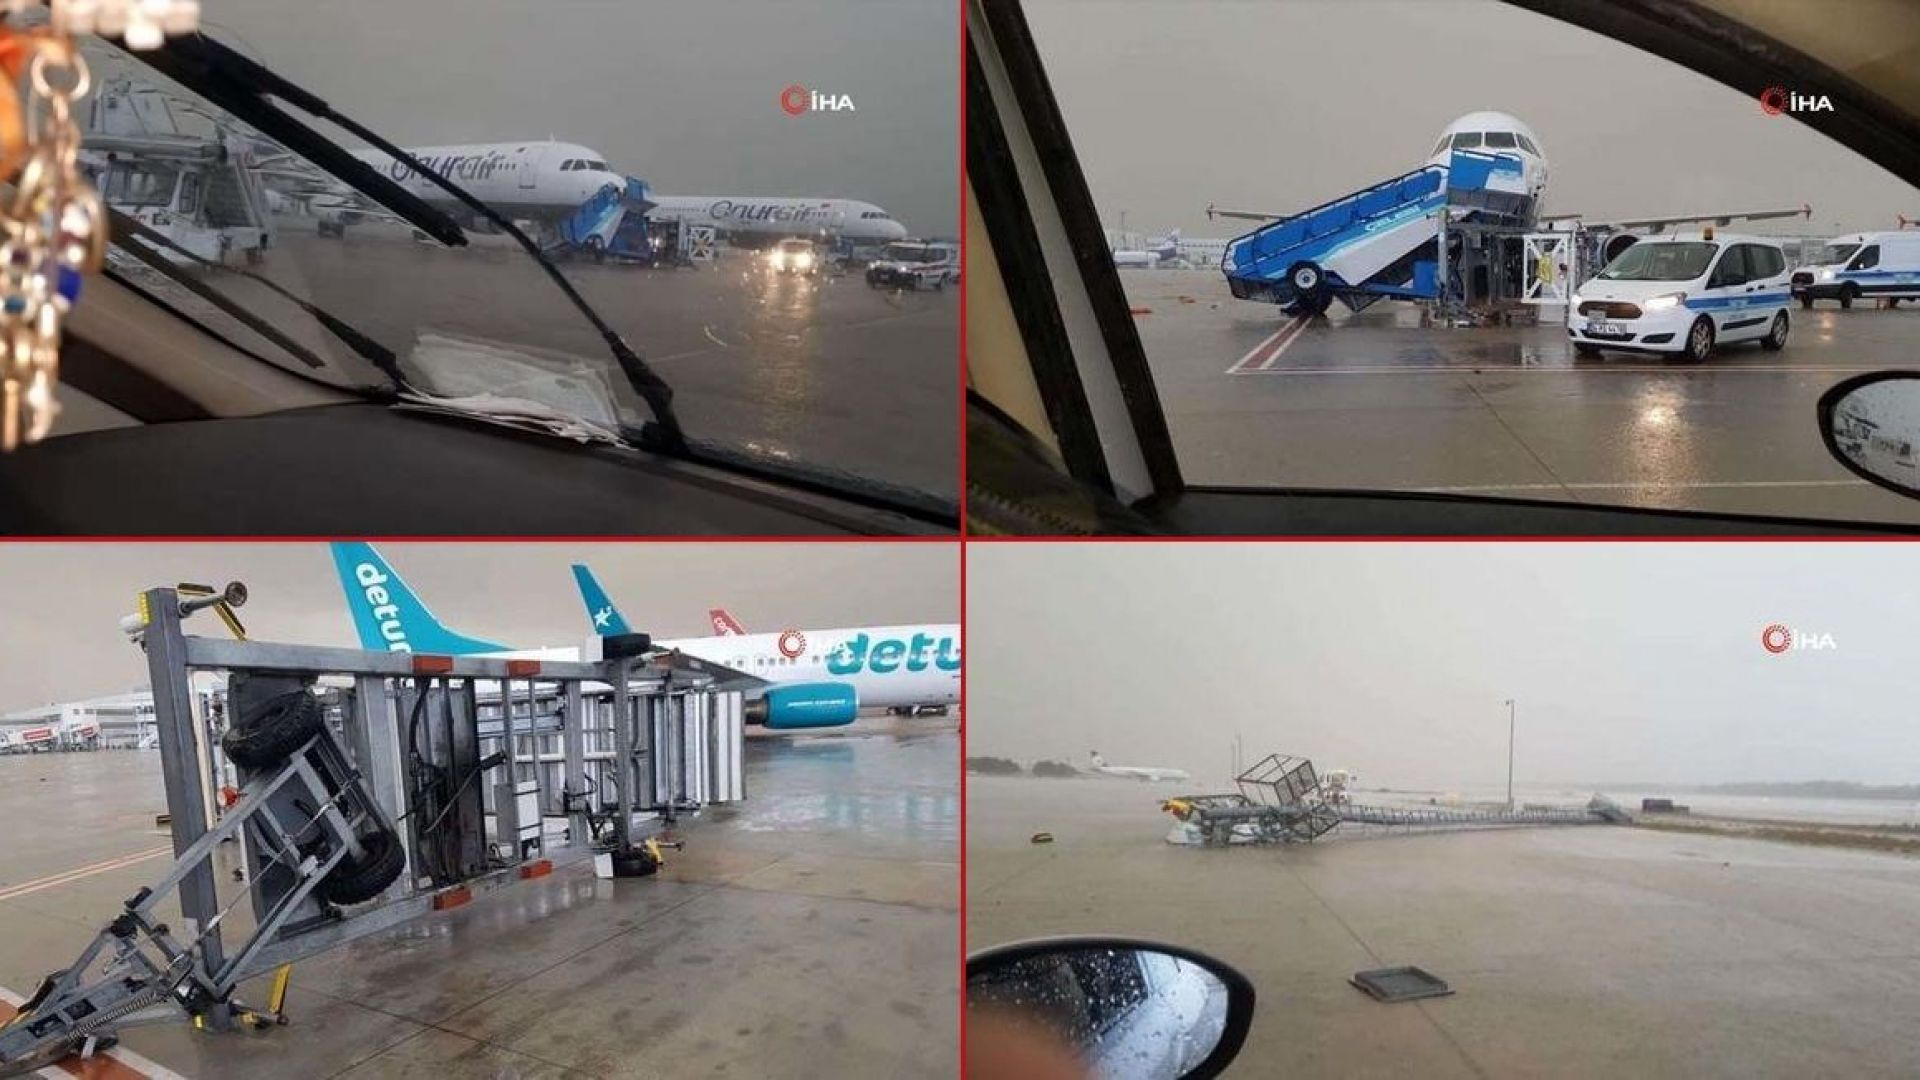 Торнадо на летището в Анталия - 2 повредени самолета и 12 пострадали